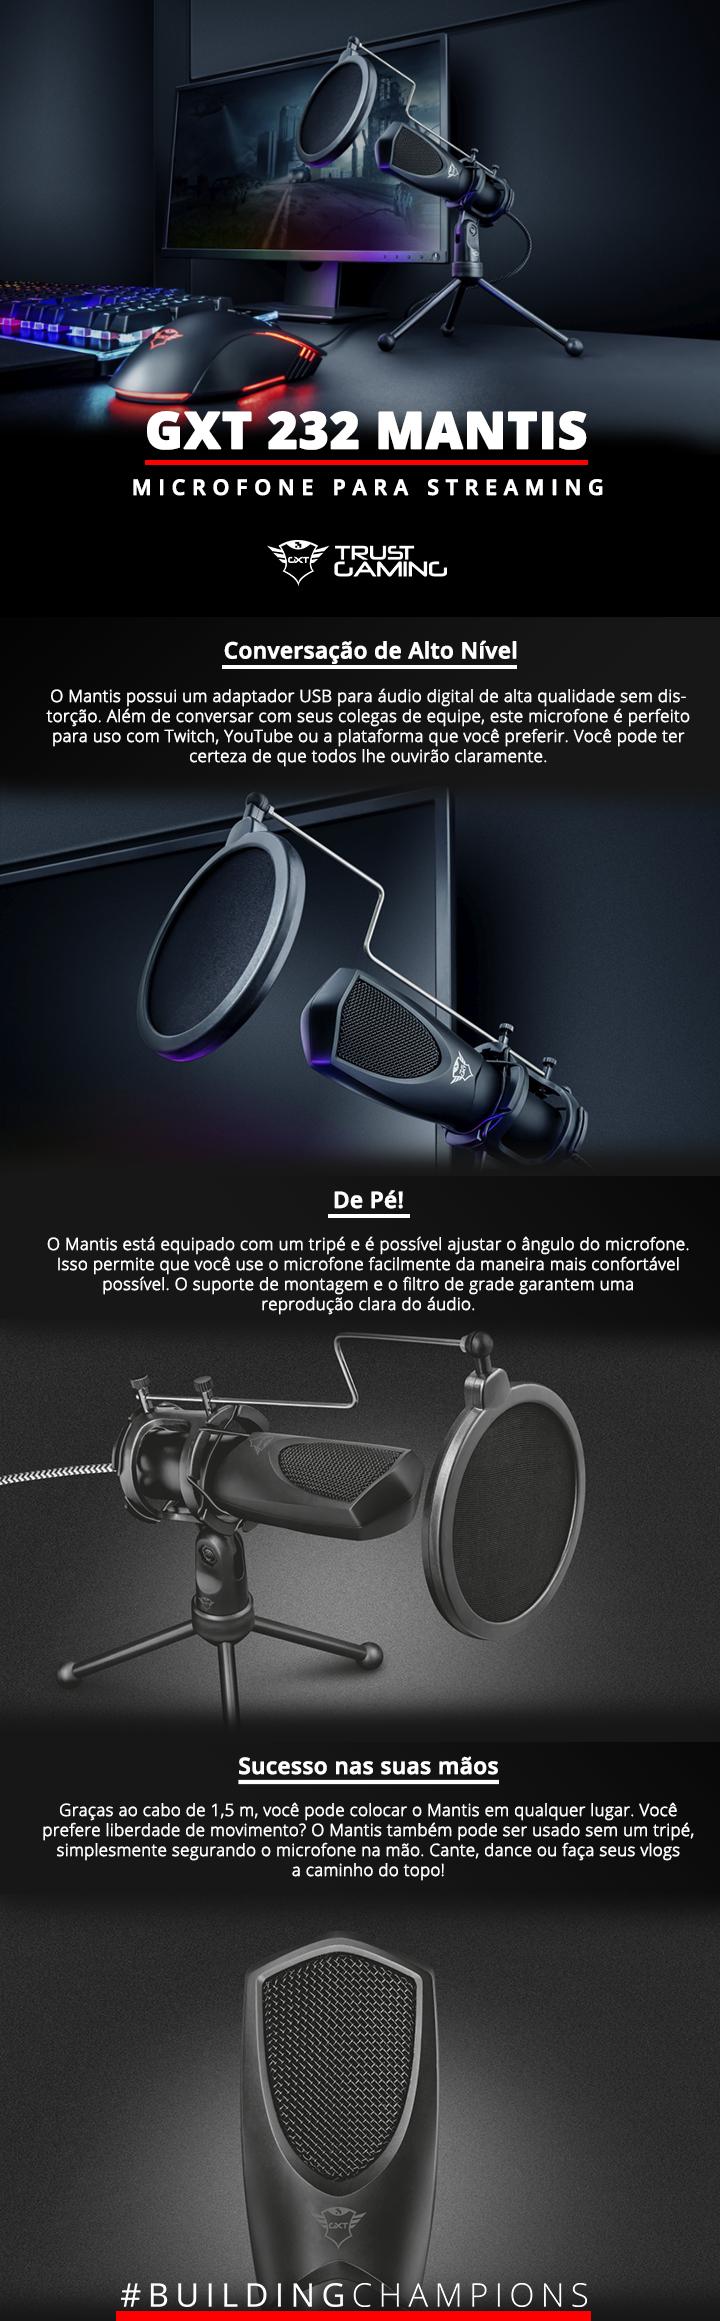 Microfone Condensador trust Mantis GXT 323 Streaming[